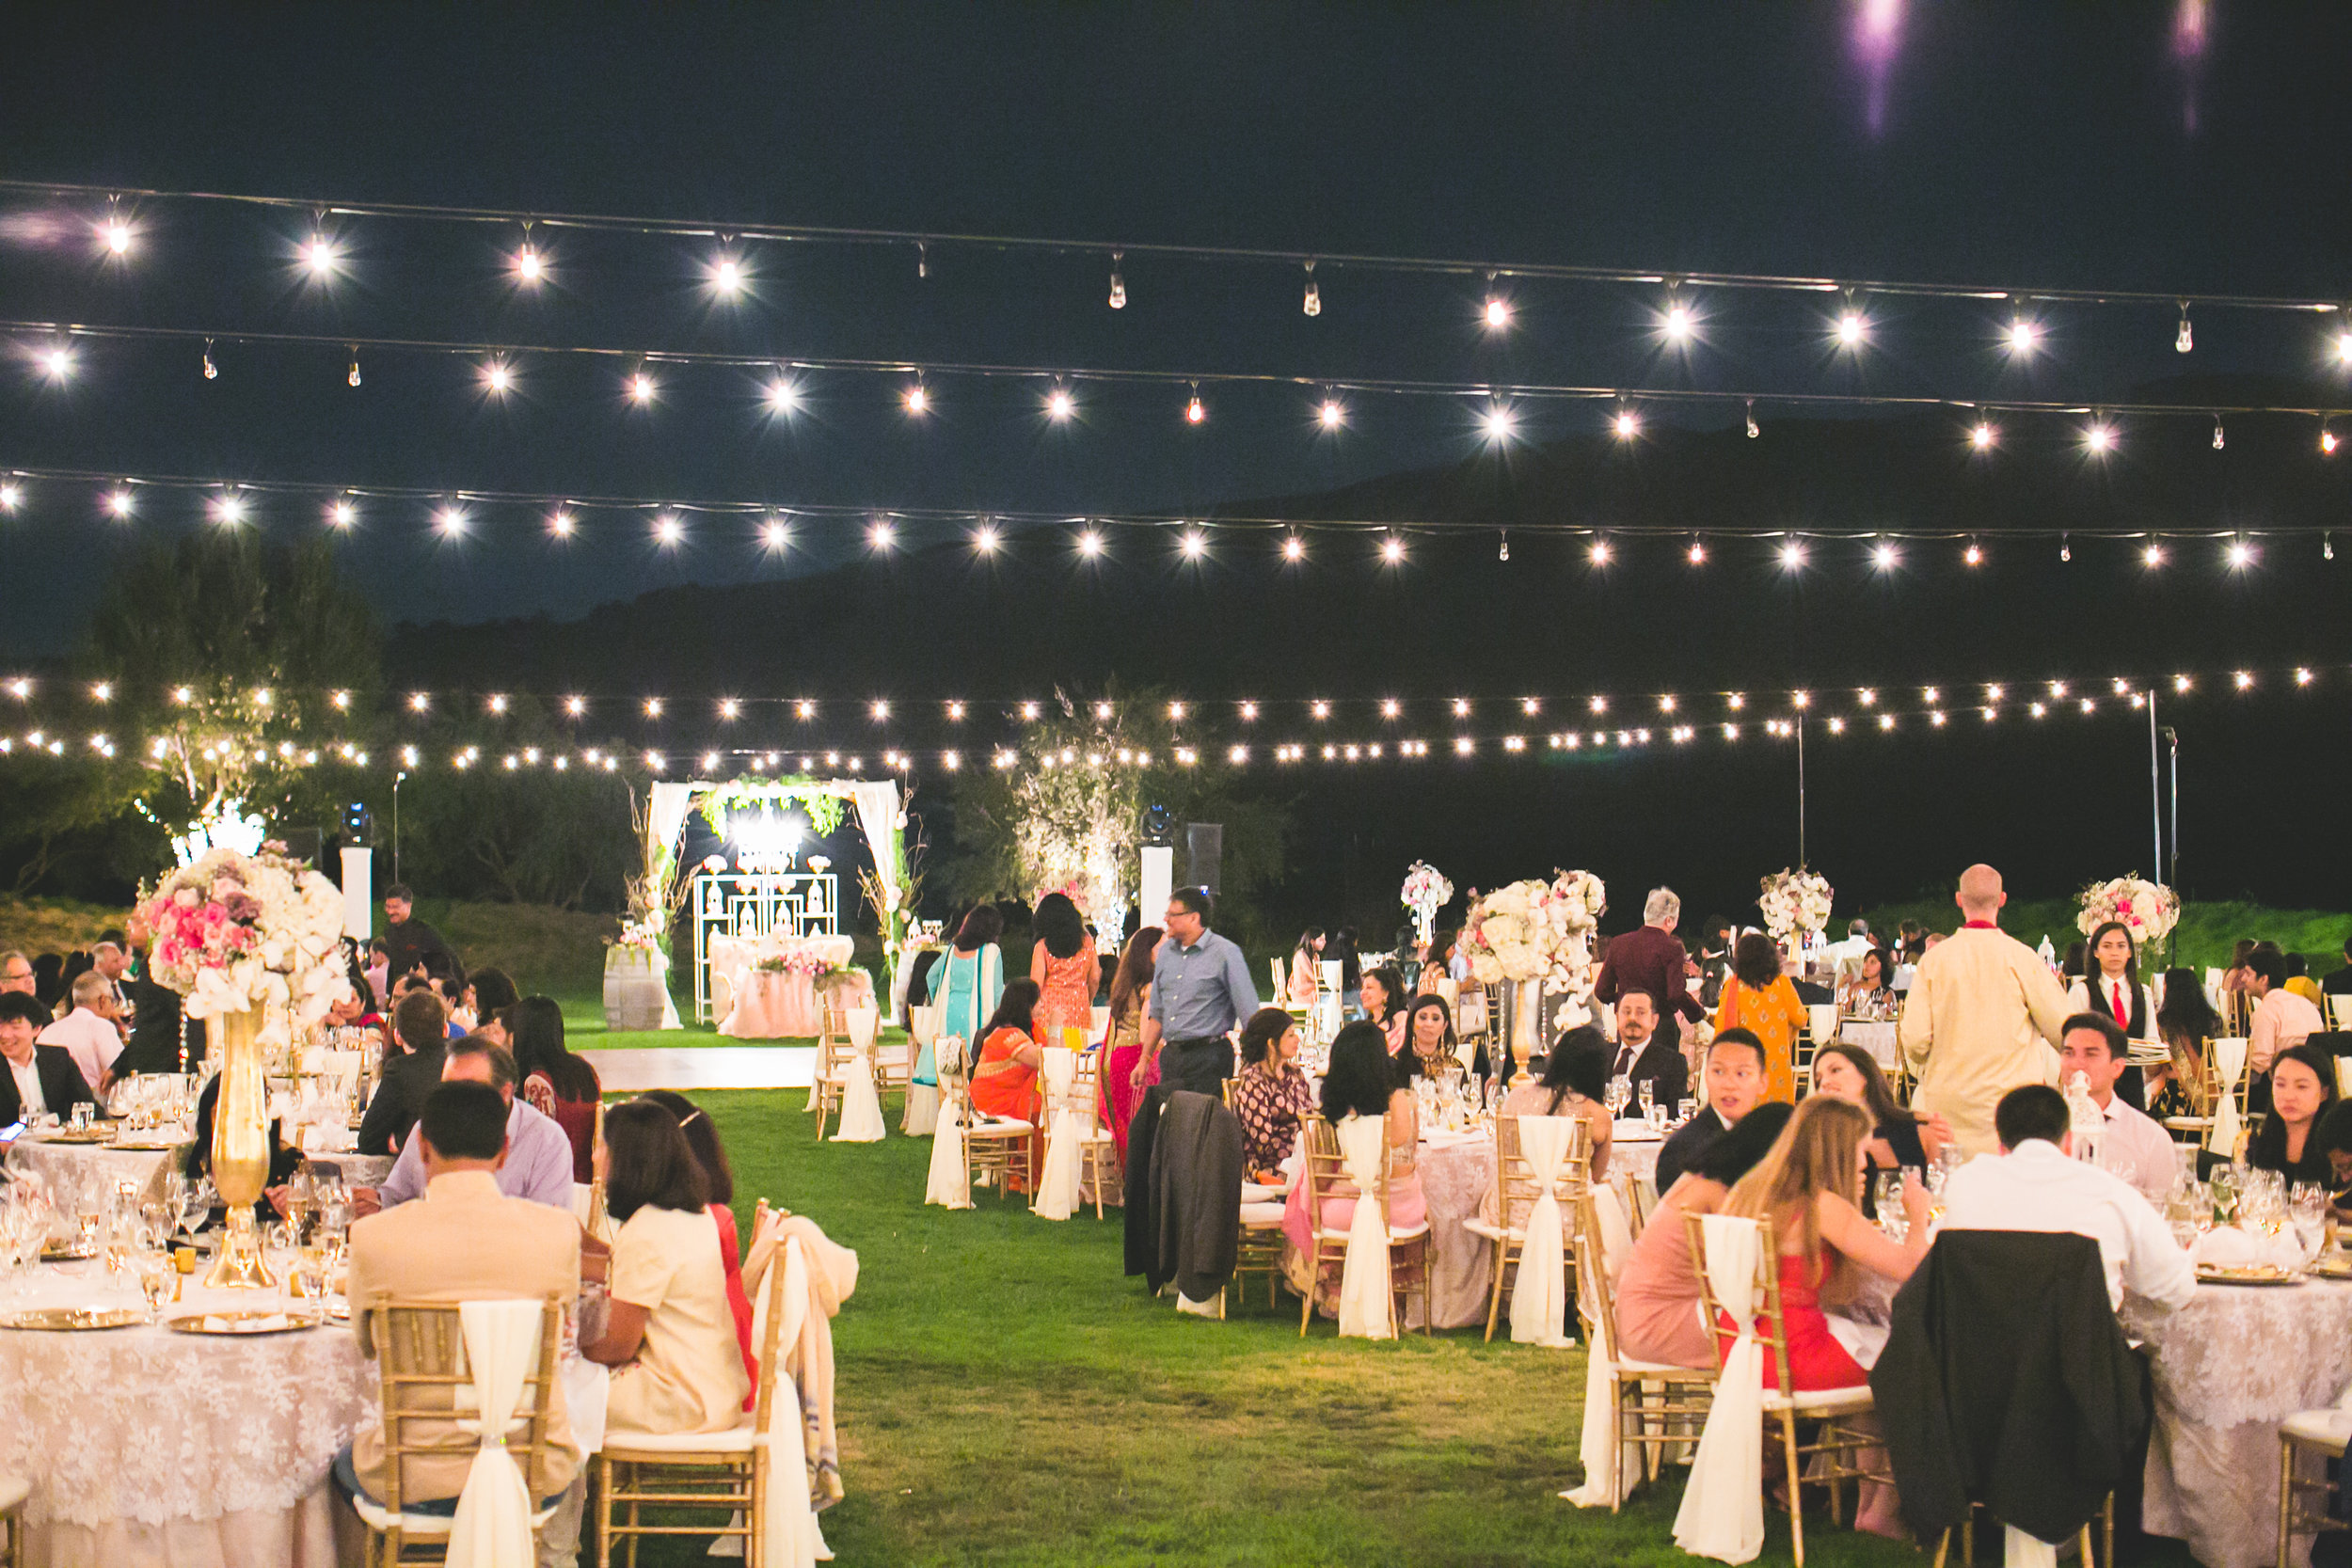 karina_asresh_wedding-0835.jpg